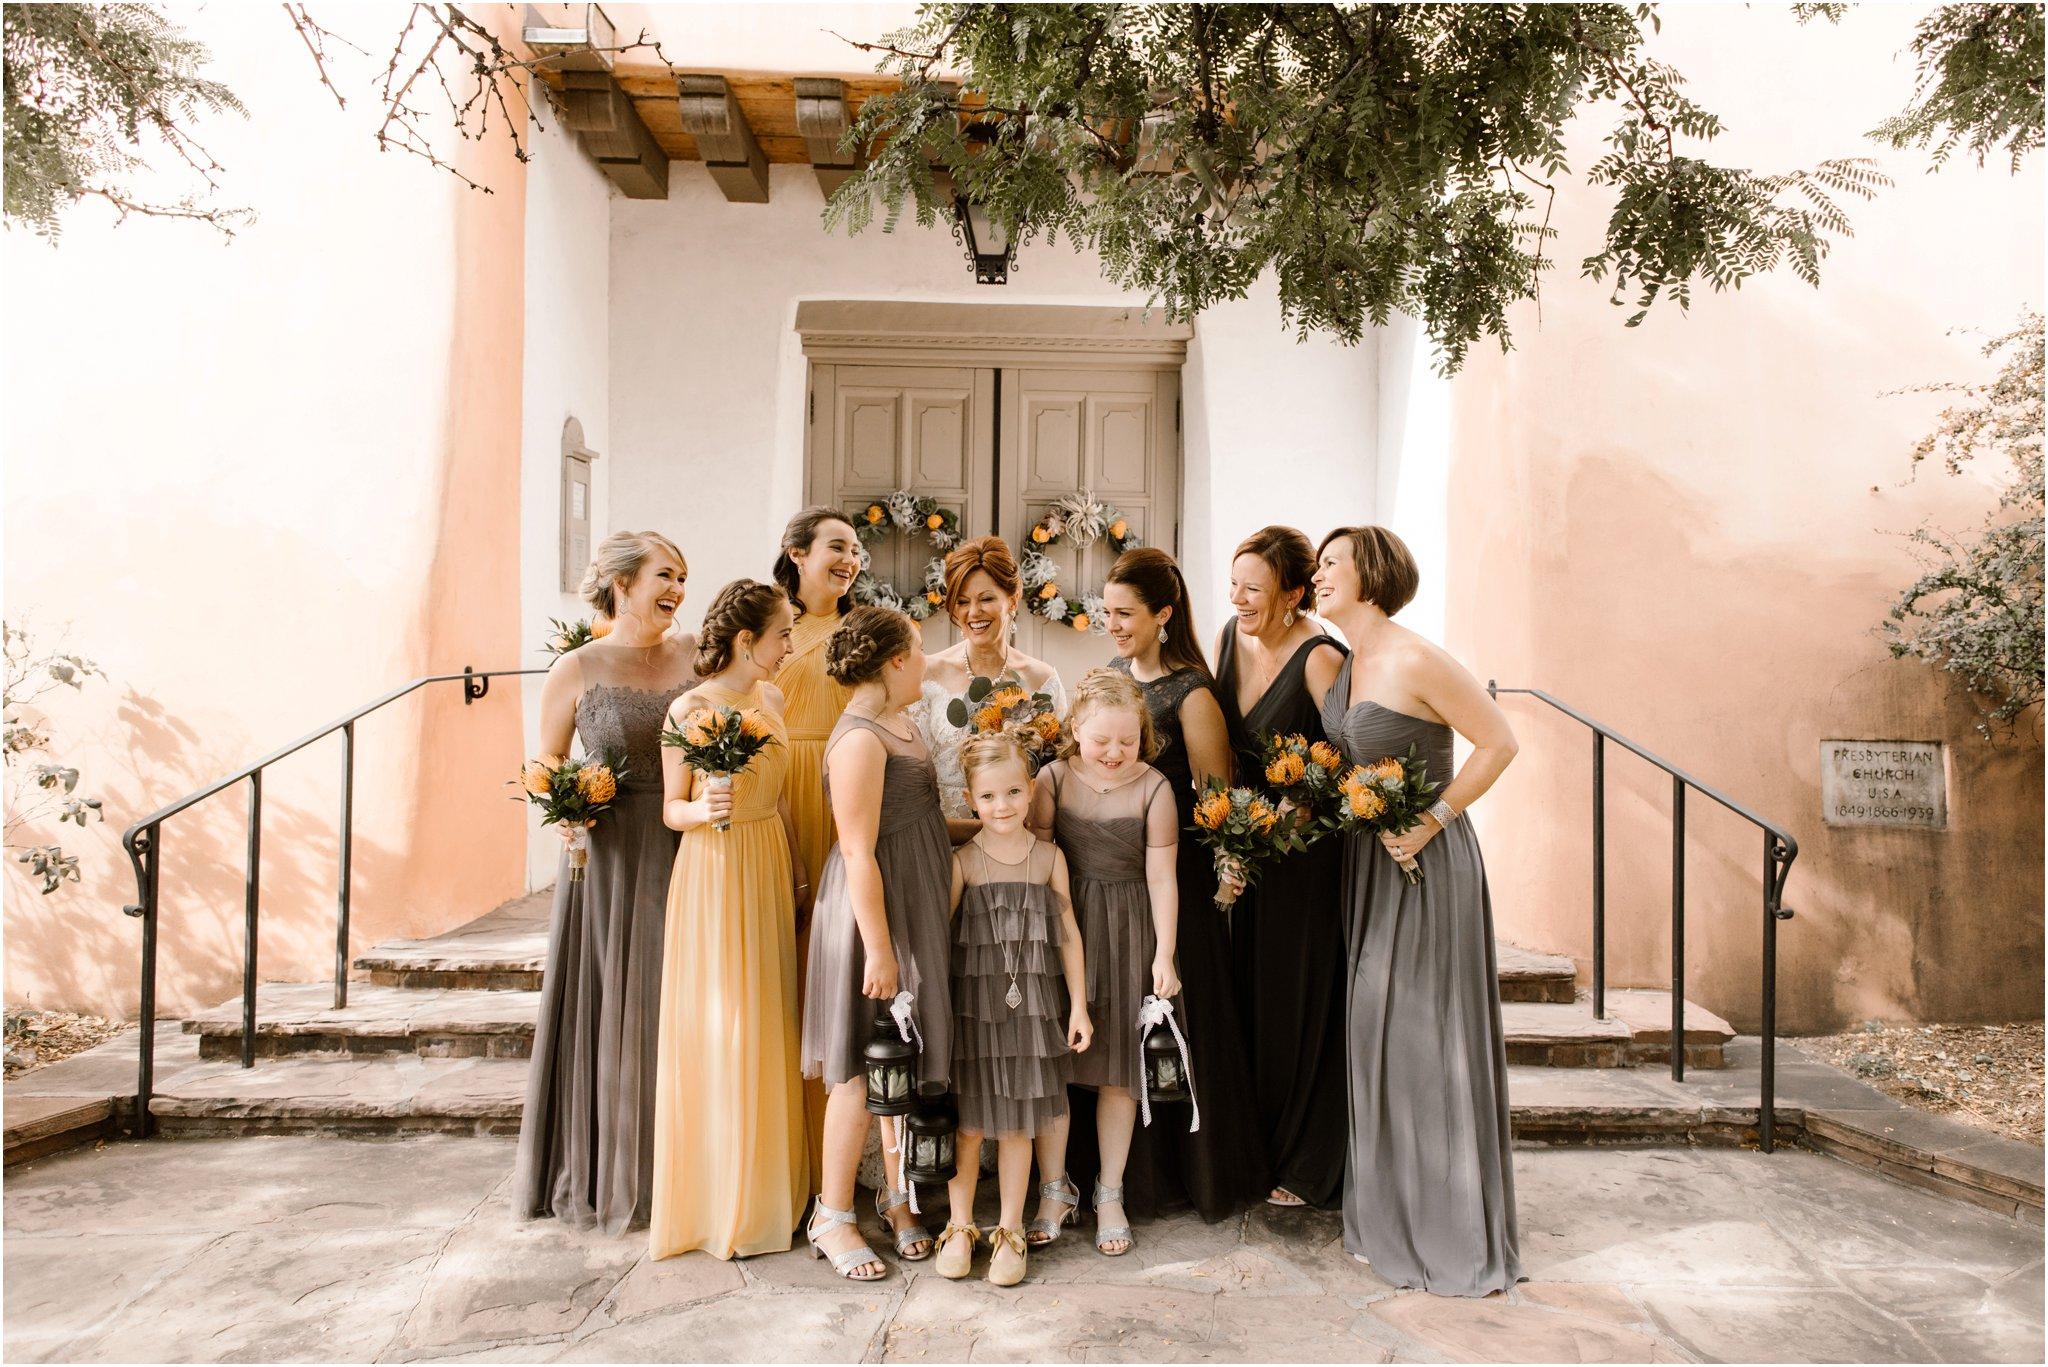 0023Santa Fe Wedding _Inn and Spa at Loretto Wedding, Inn and Spa at Loretto wedding, Santa Fe wedding photographers, blue rose photography